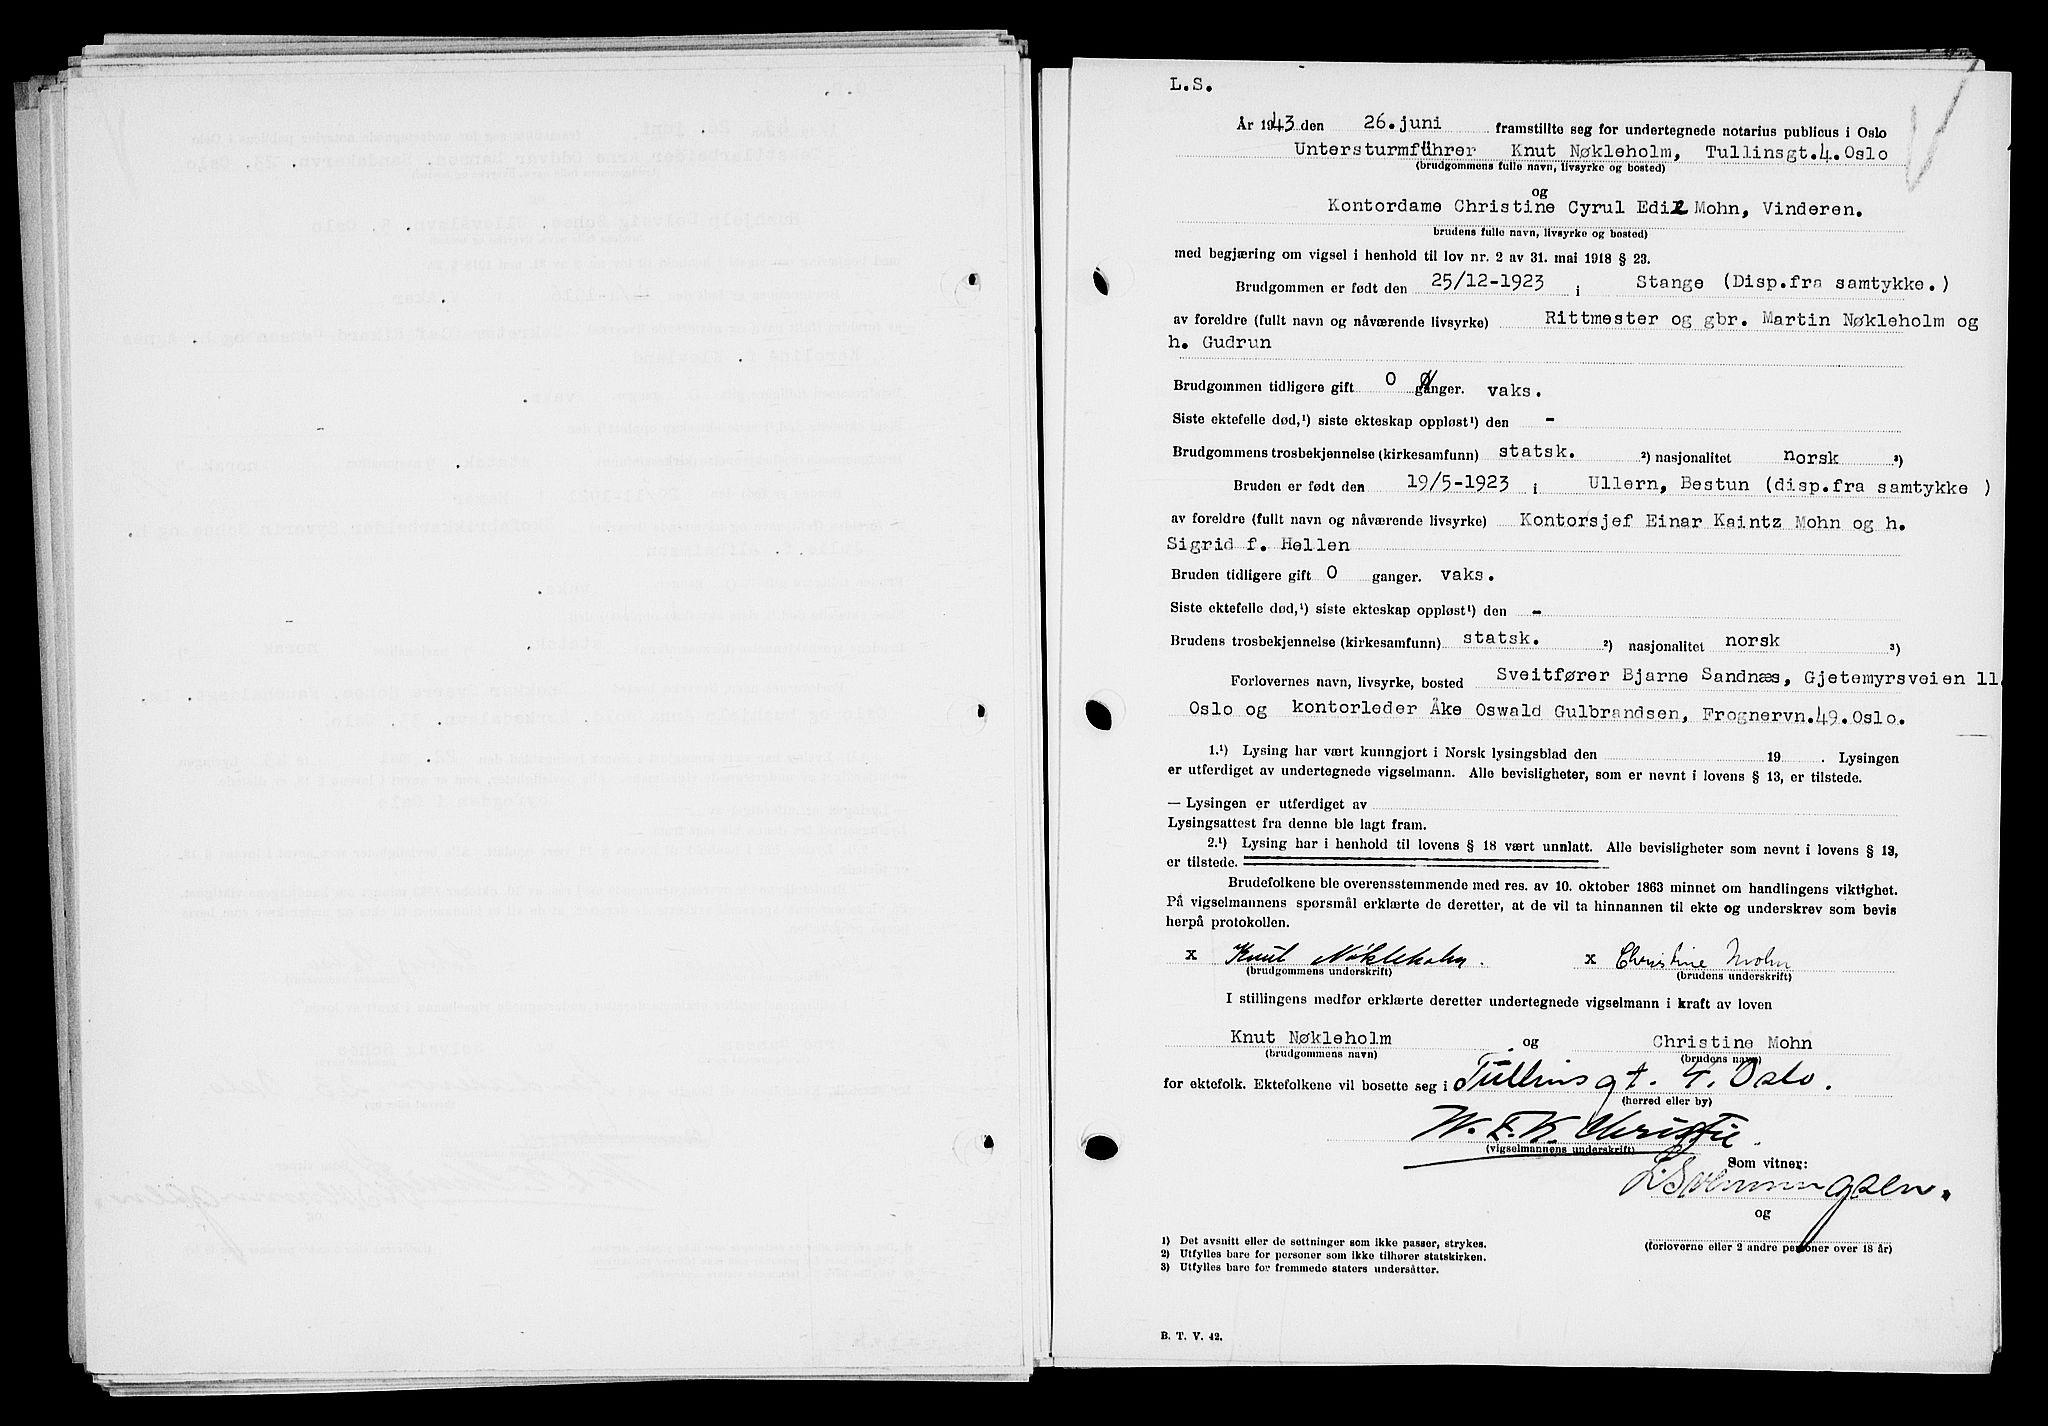 SAO, Oslo byfogd avd. I, L/Lb/Lbb/L0045: Notarialprotokoll, rekke II: Vigsler, 1943